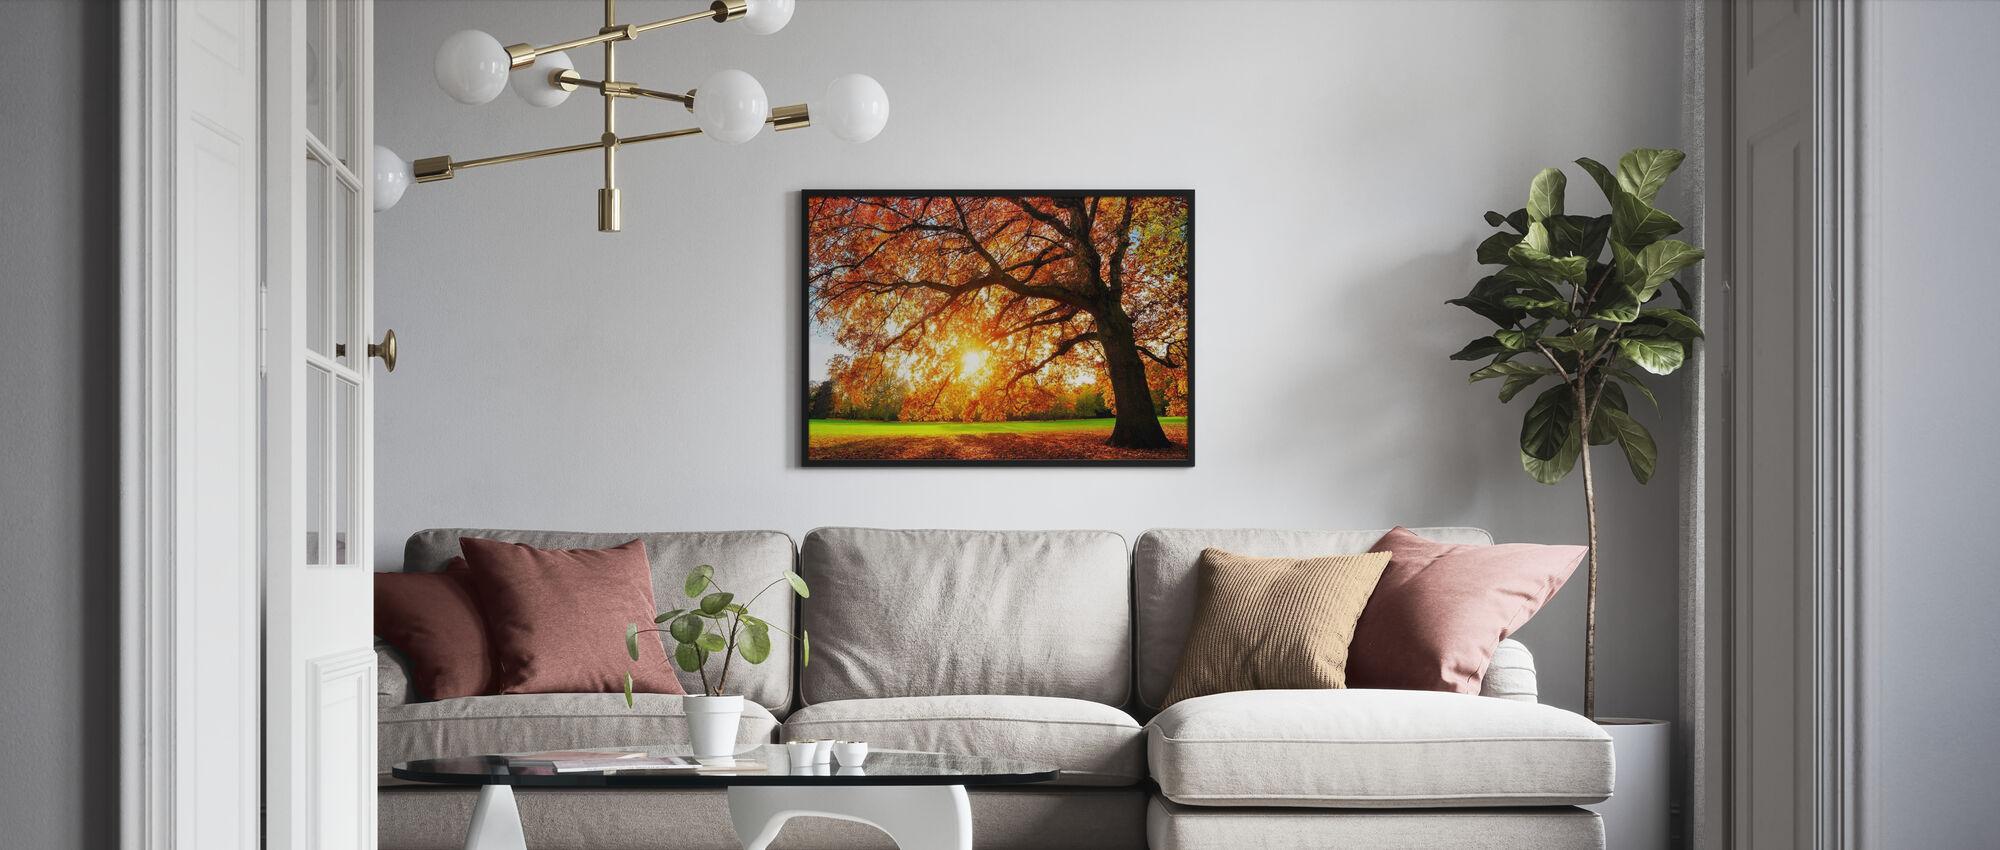 Majestic Oak Tree - Poster - Living Room